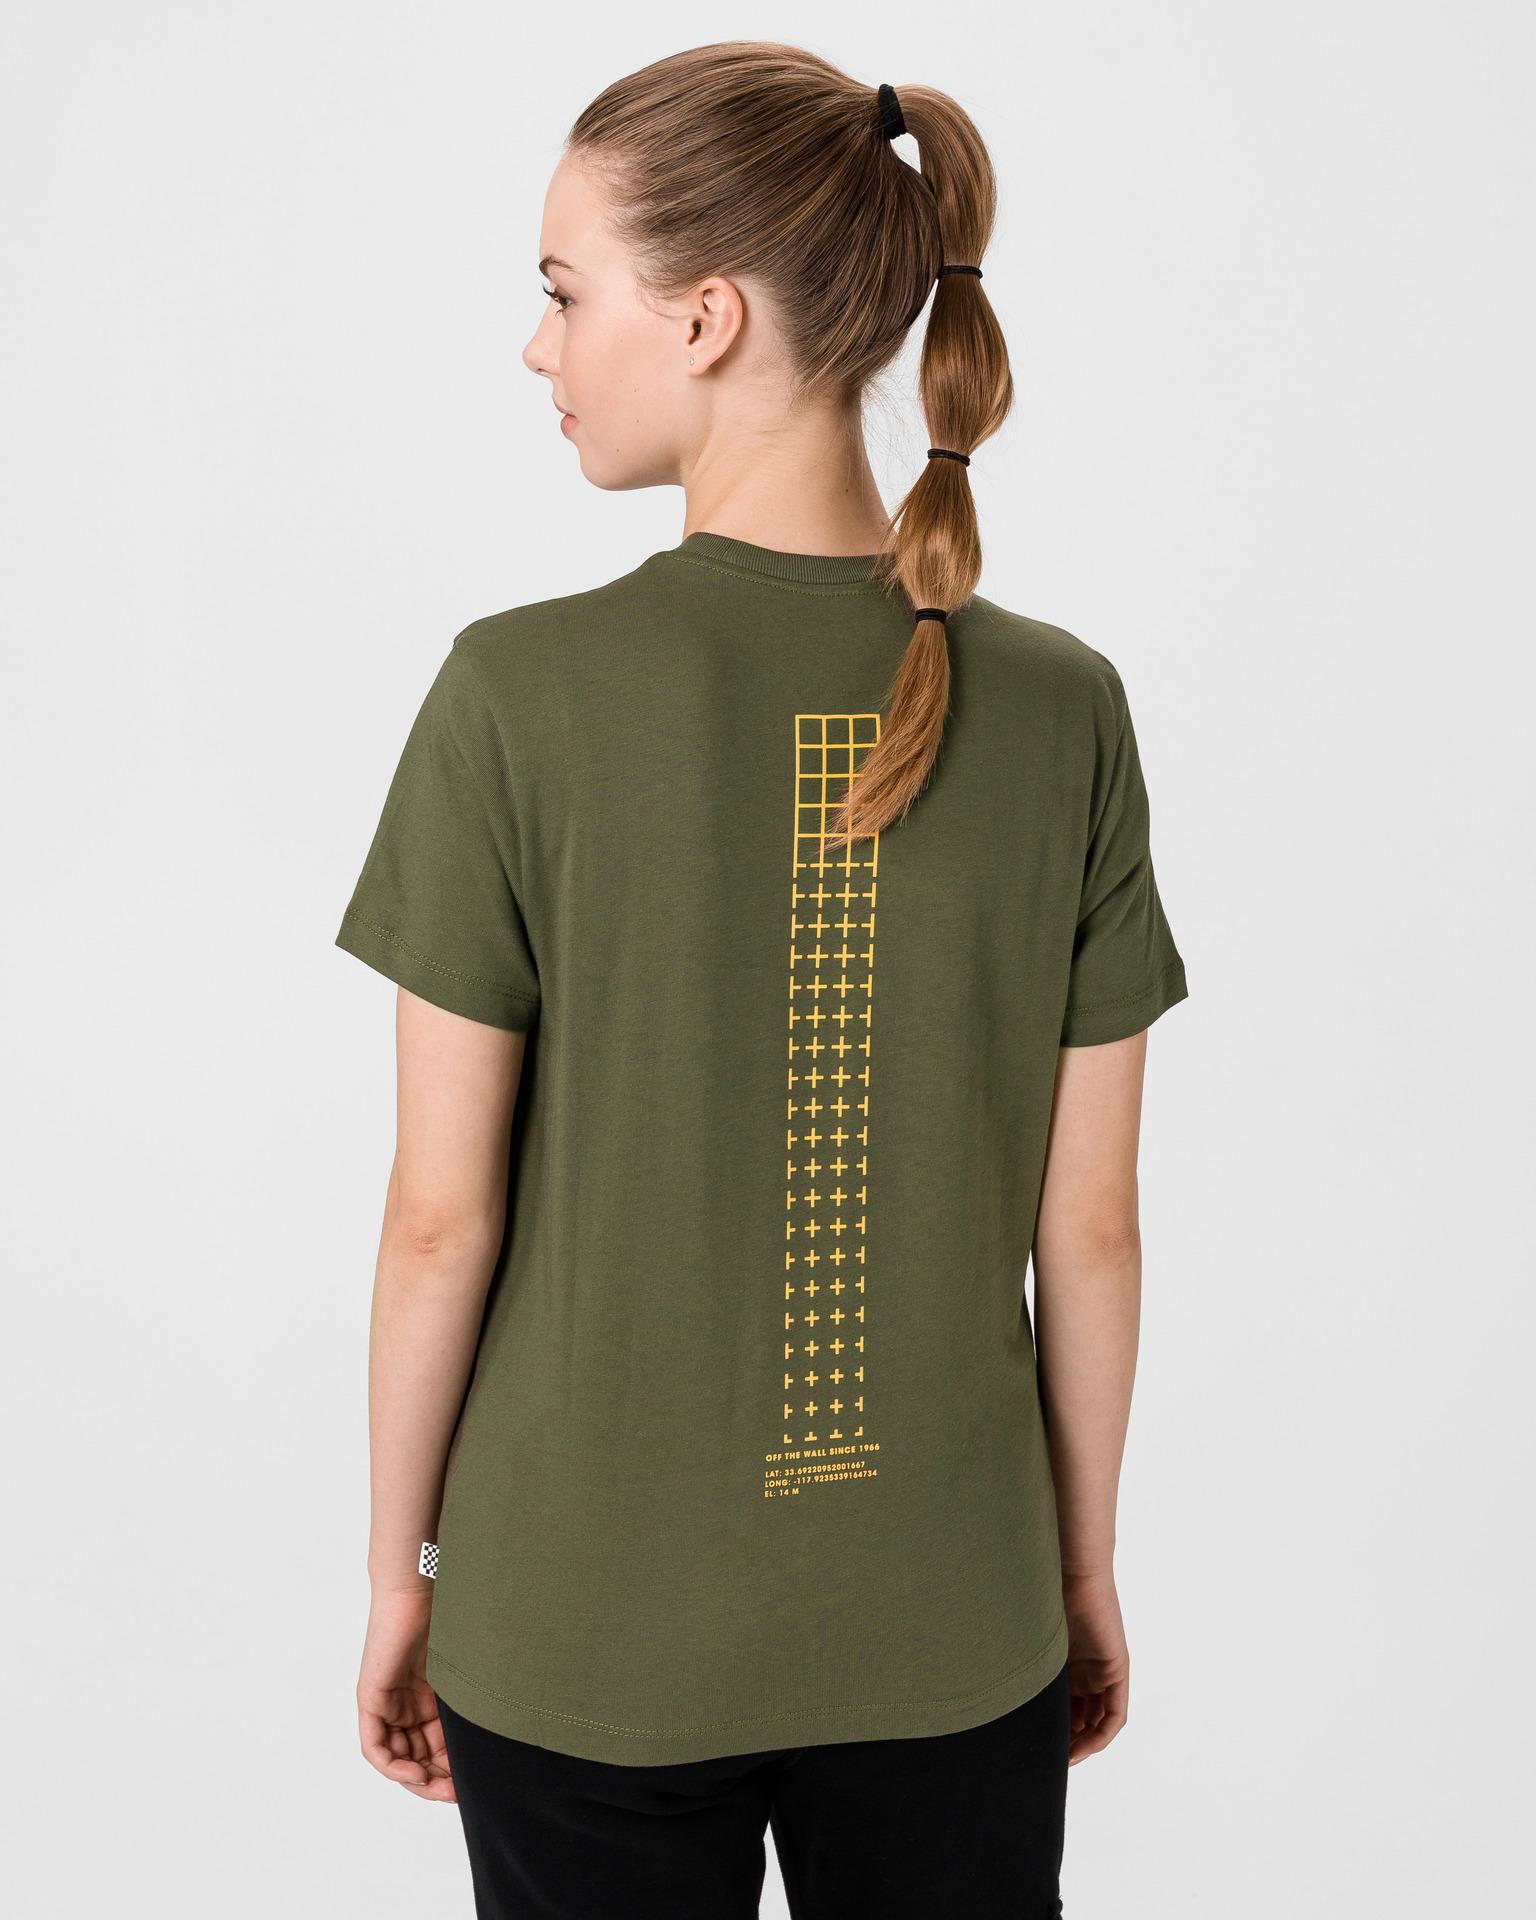 Vans green T-shirt 66 Supply Tri